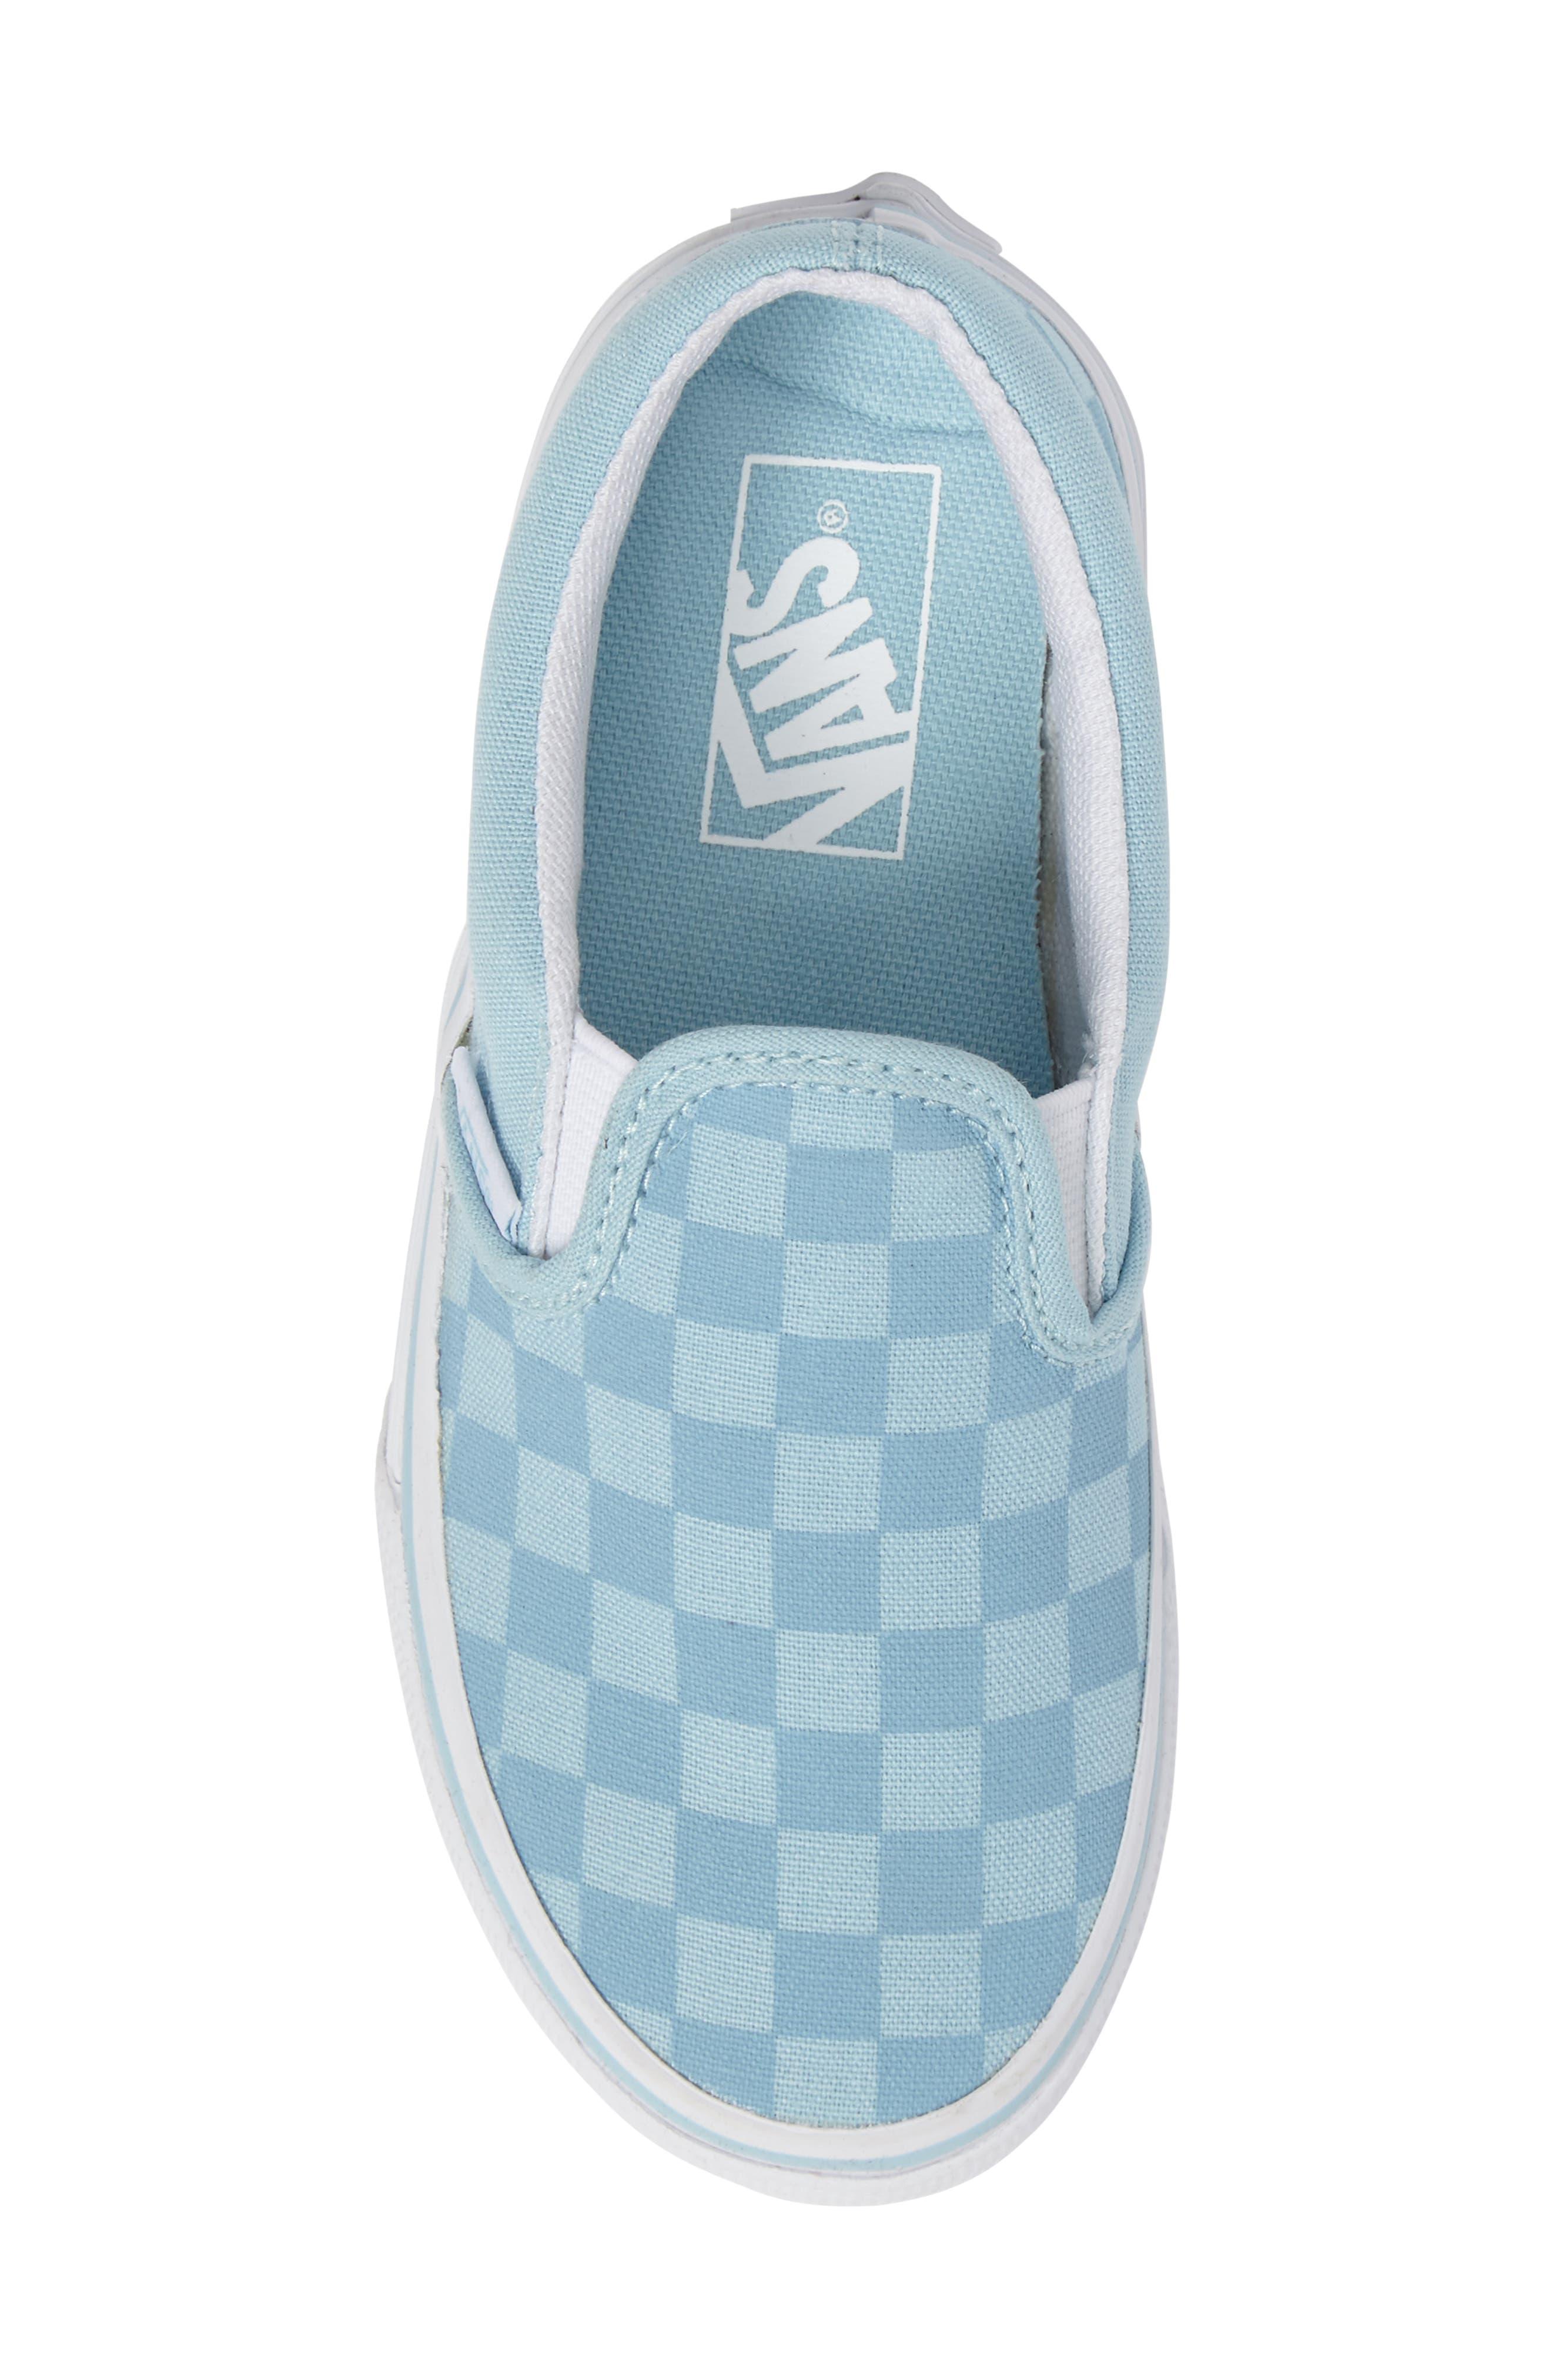 Alternate Image 5  - Vans Classic Slip-On Sneaker (Walker, Toddler, Little Kid & Big Kid)